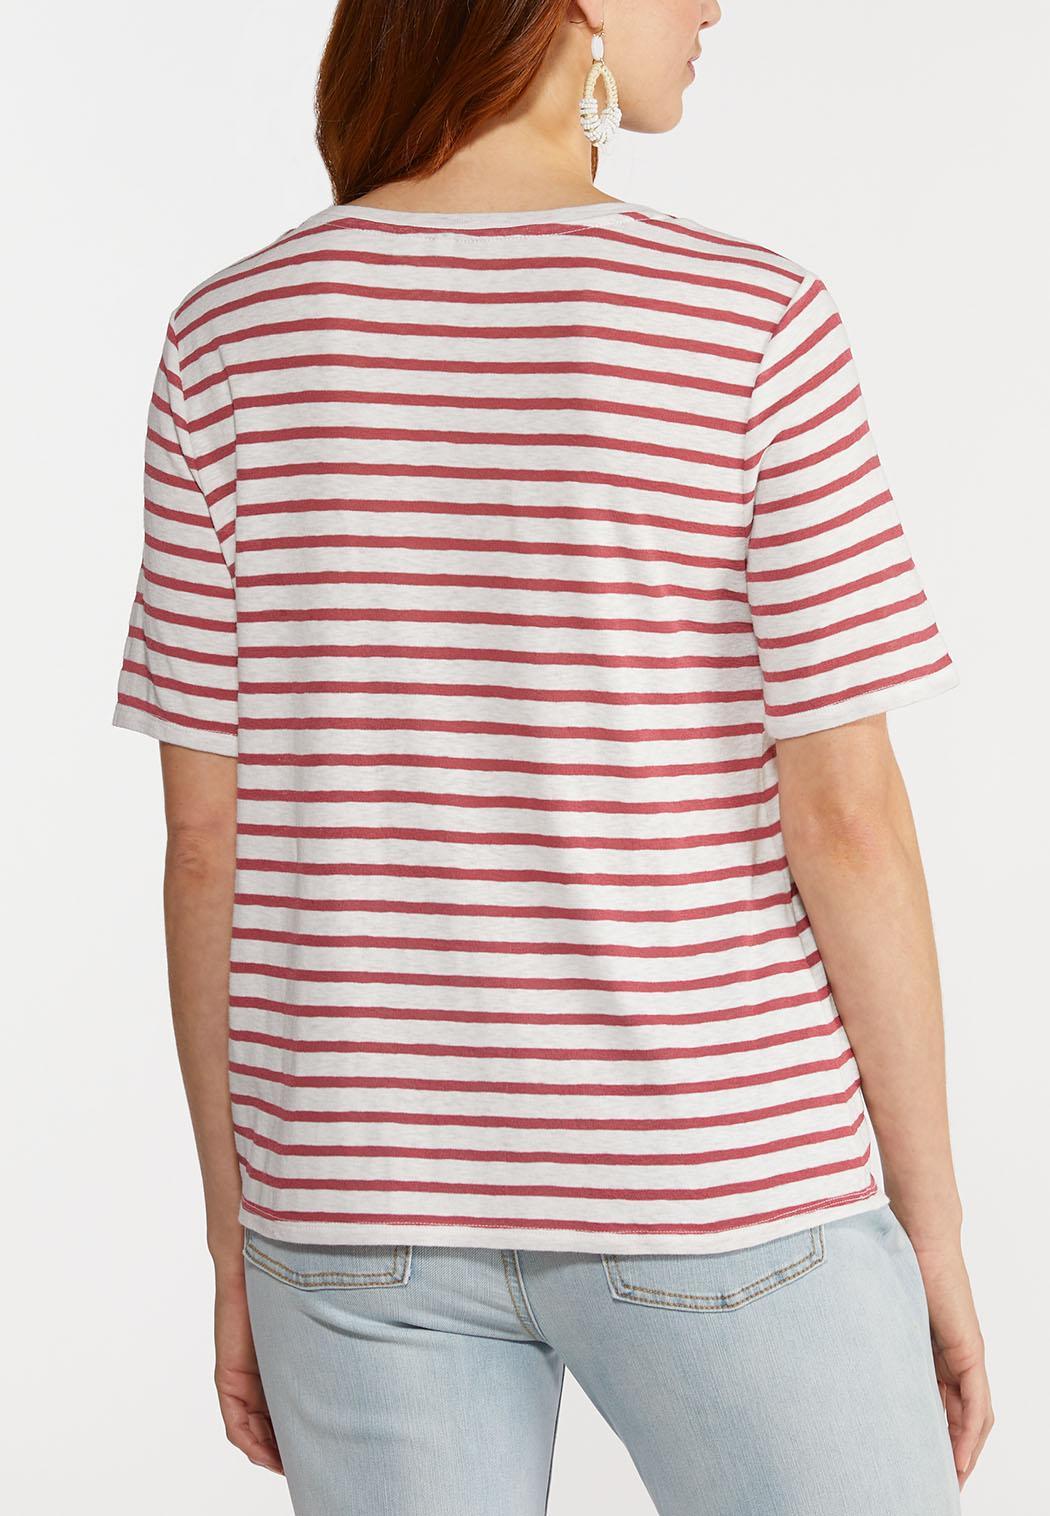 Striped Side Cinch Tee (Item #44289234)